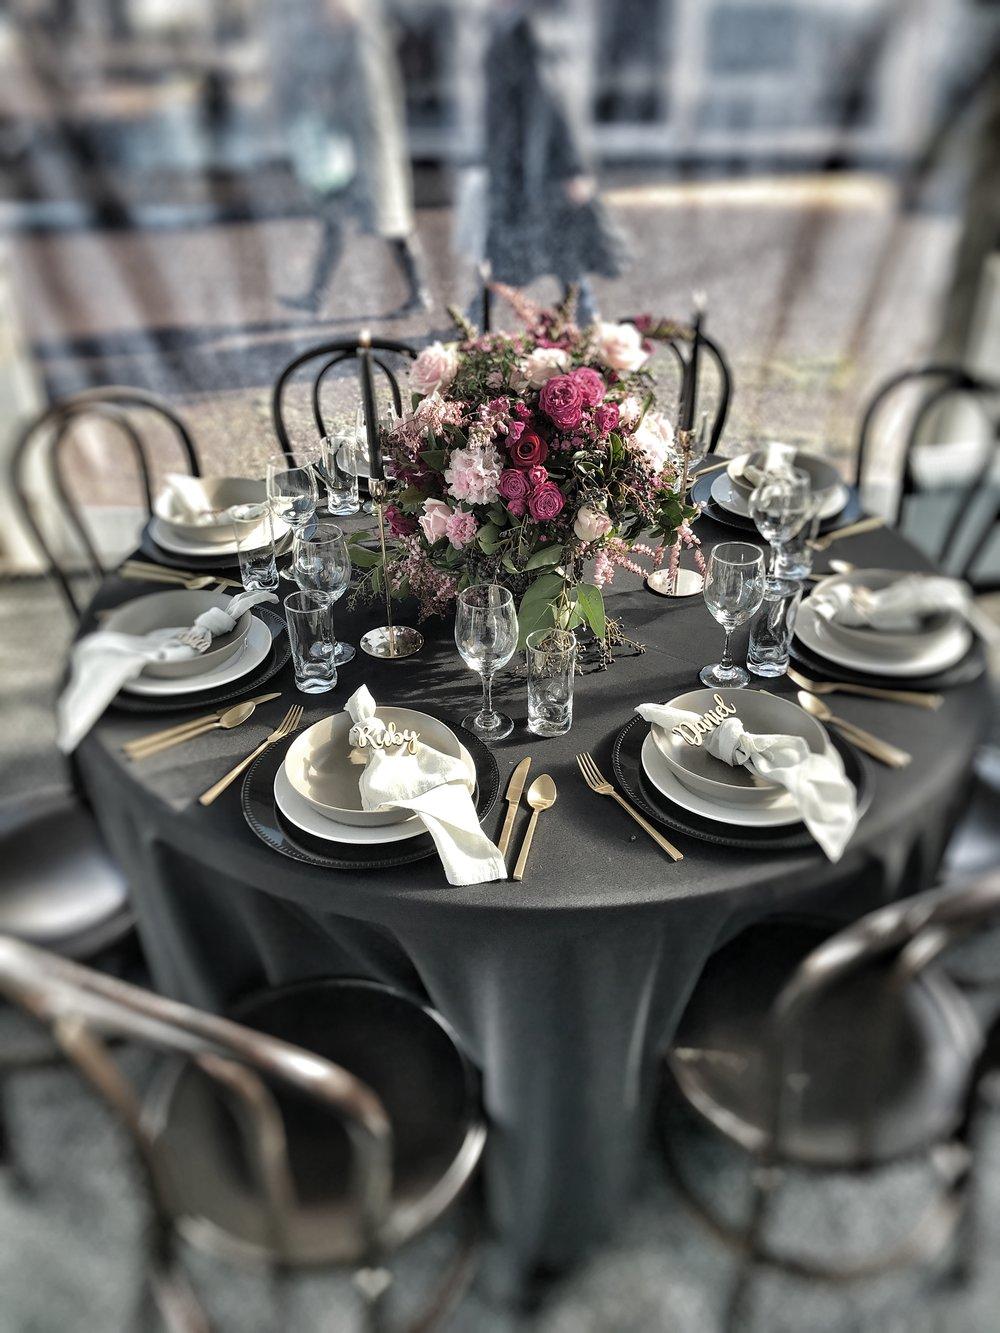 Copy of Copy of warrnambool wedding styling